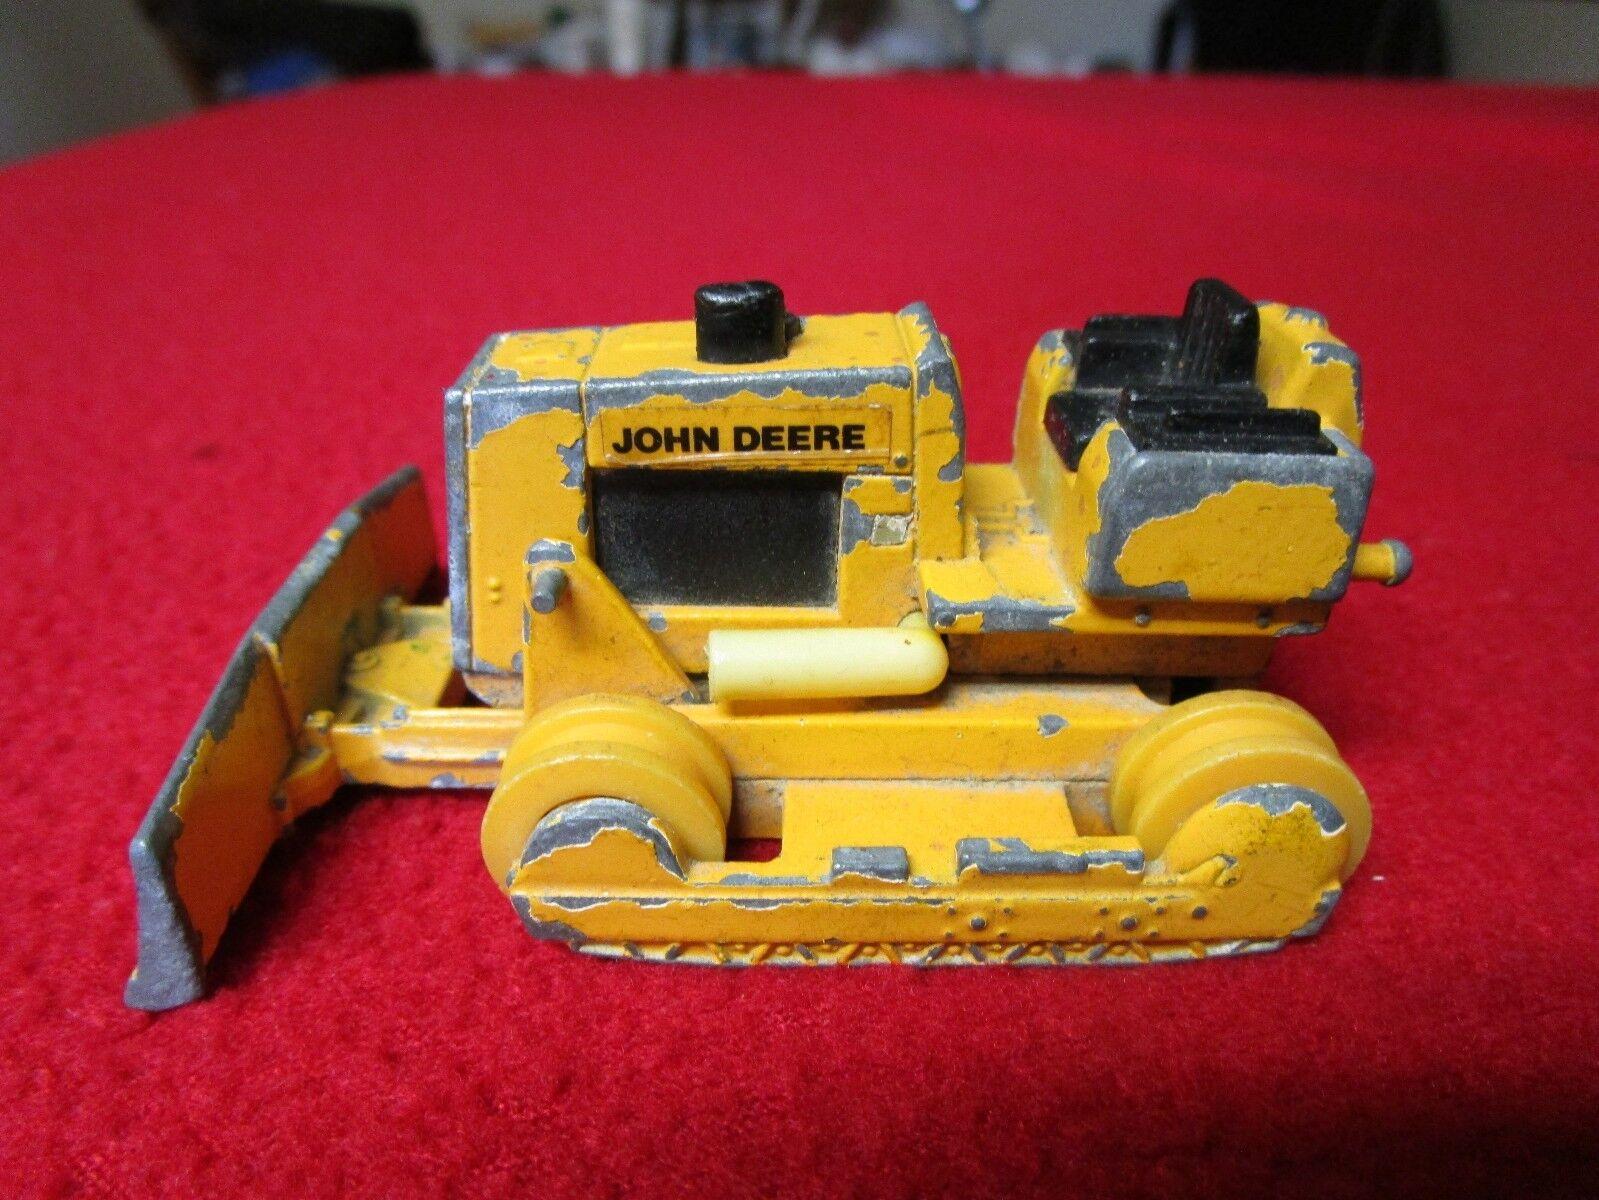 John Deere Deere Deere ERTL Dozer Tractor Bulldozer Antique Vintage Rare cc5eff